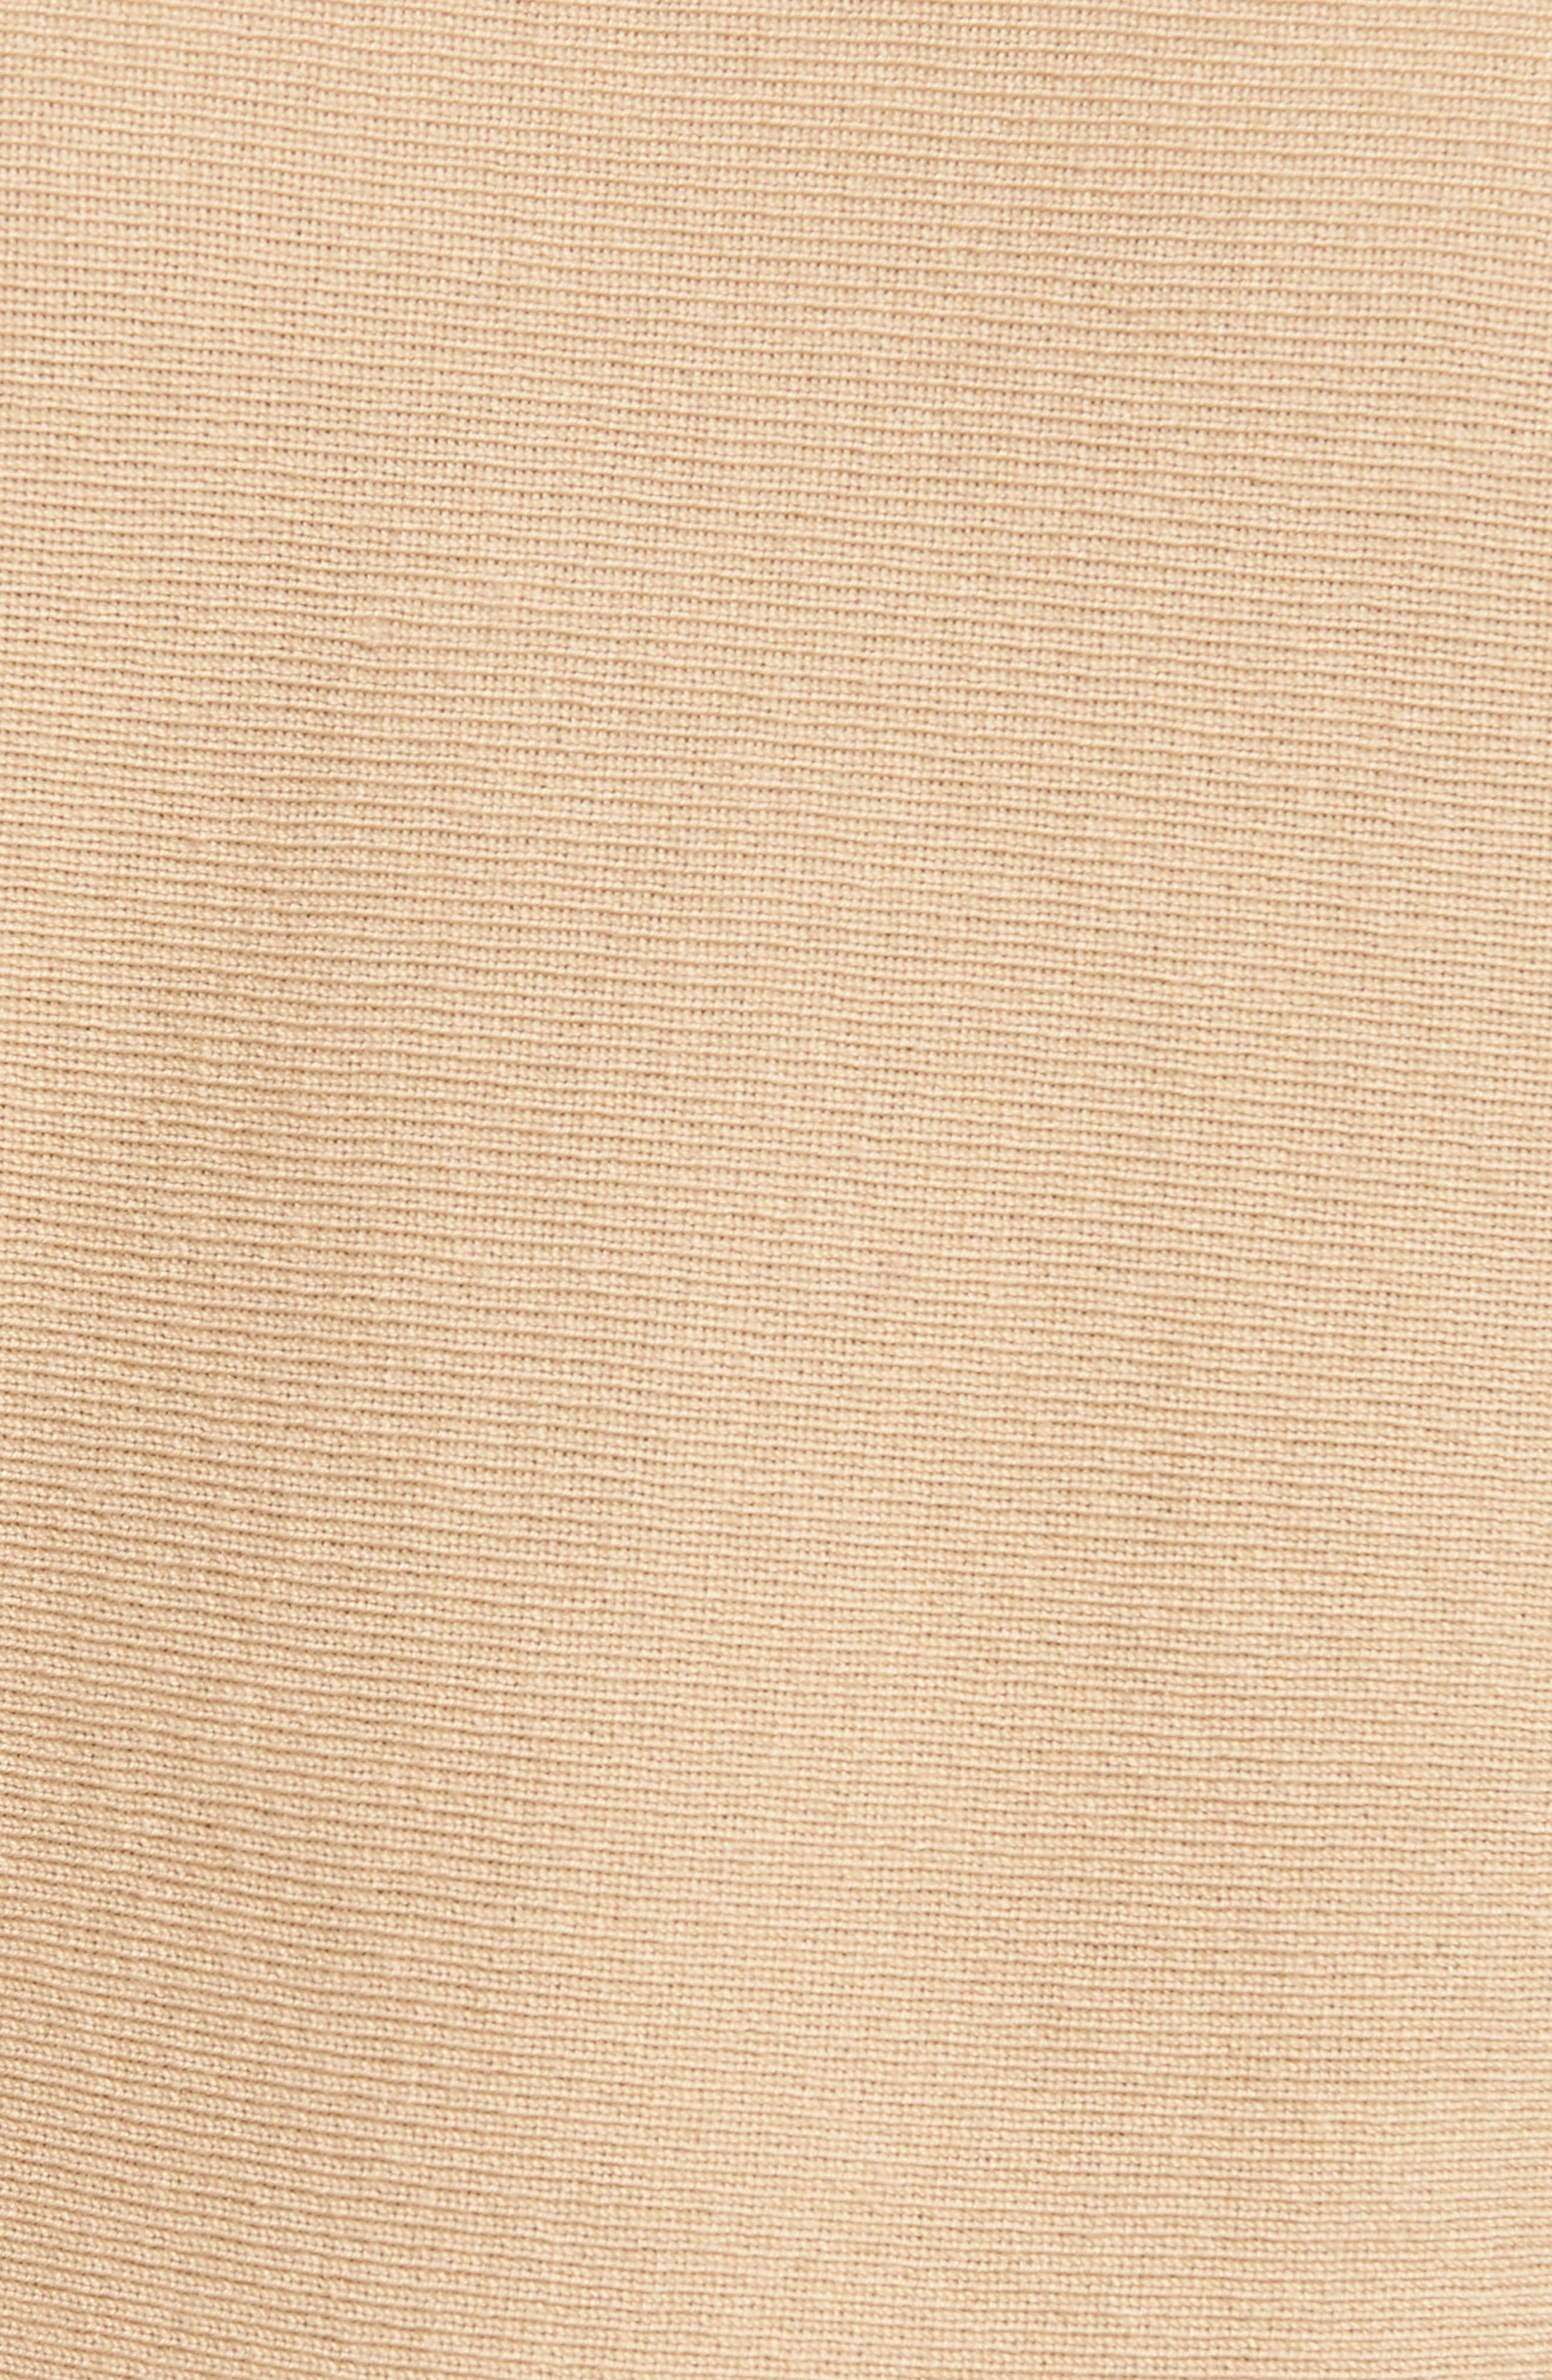 Dolman Sleeve Sweater,                             Alternate thumbnail 5, color,                             Tan Nomad